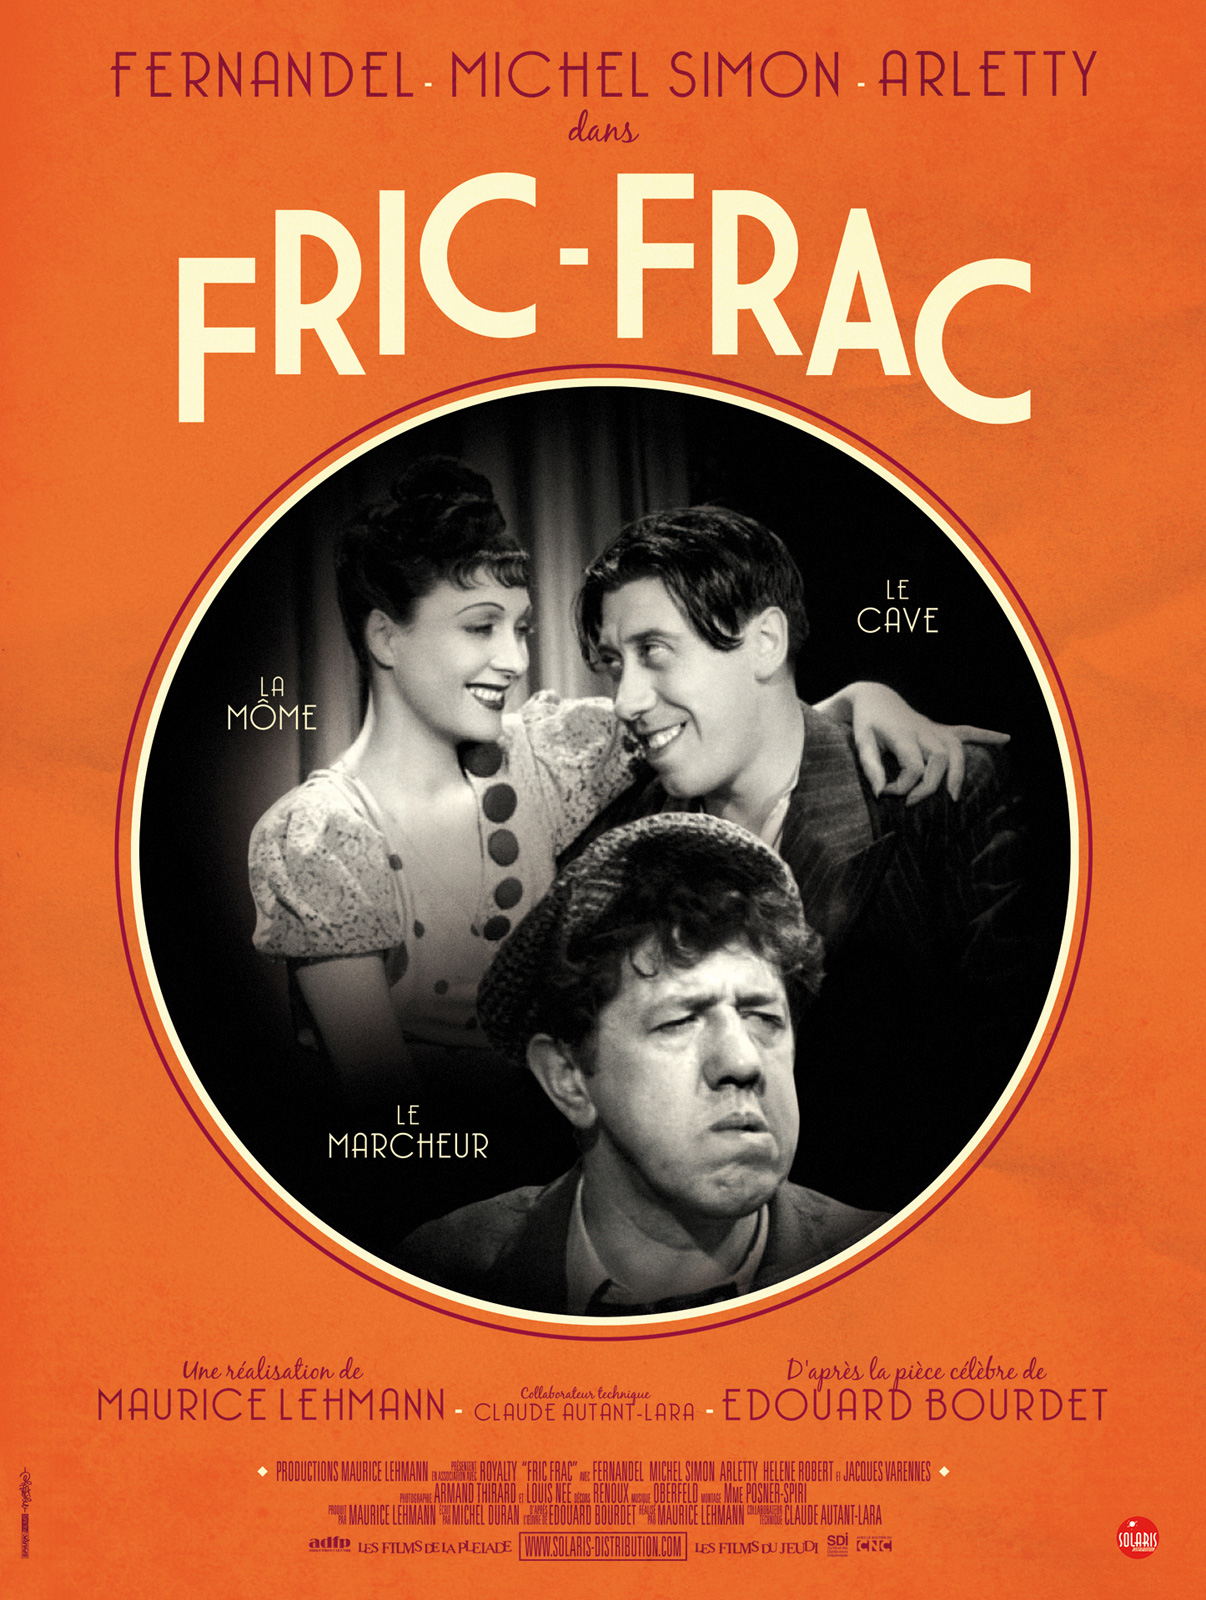 Image du film Fric-frac